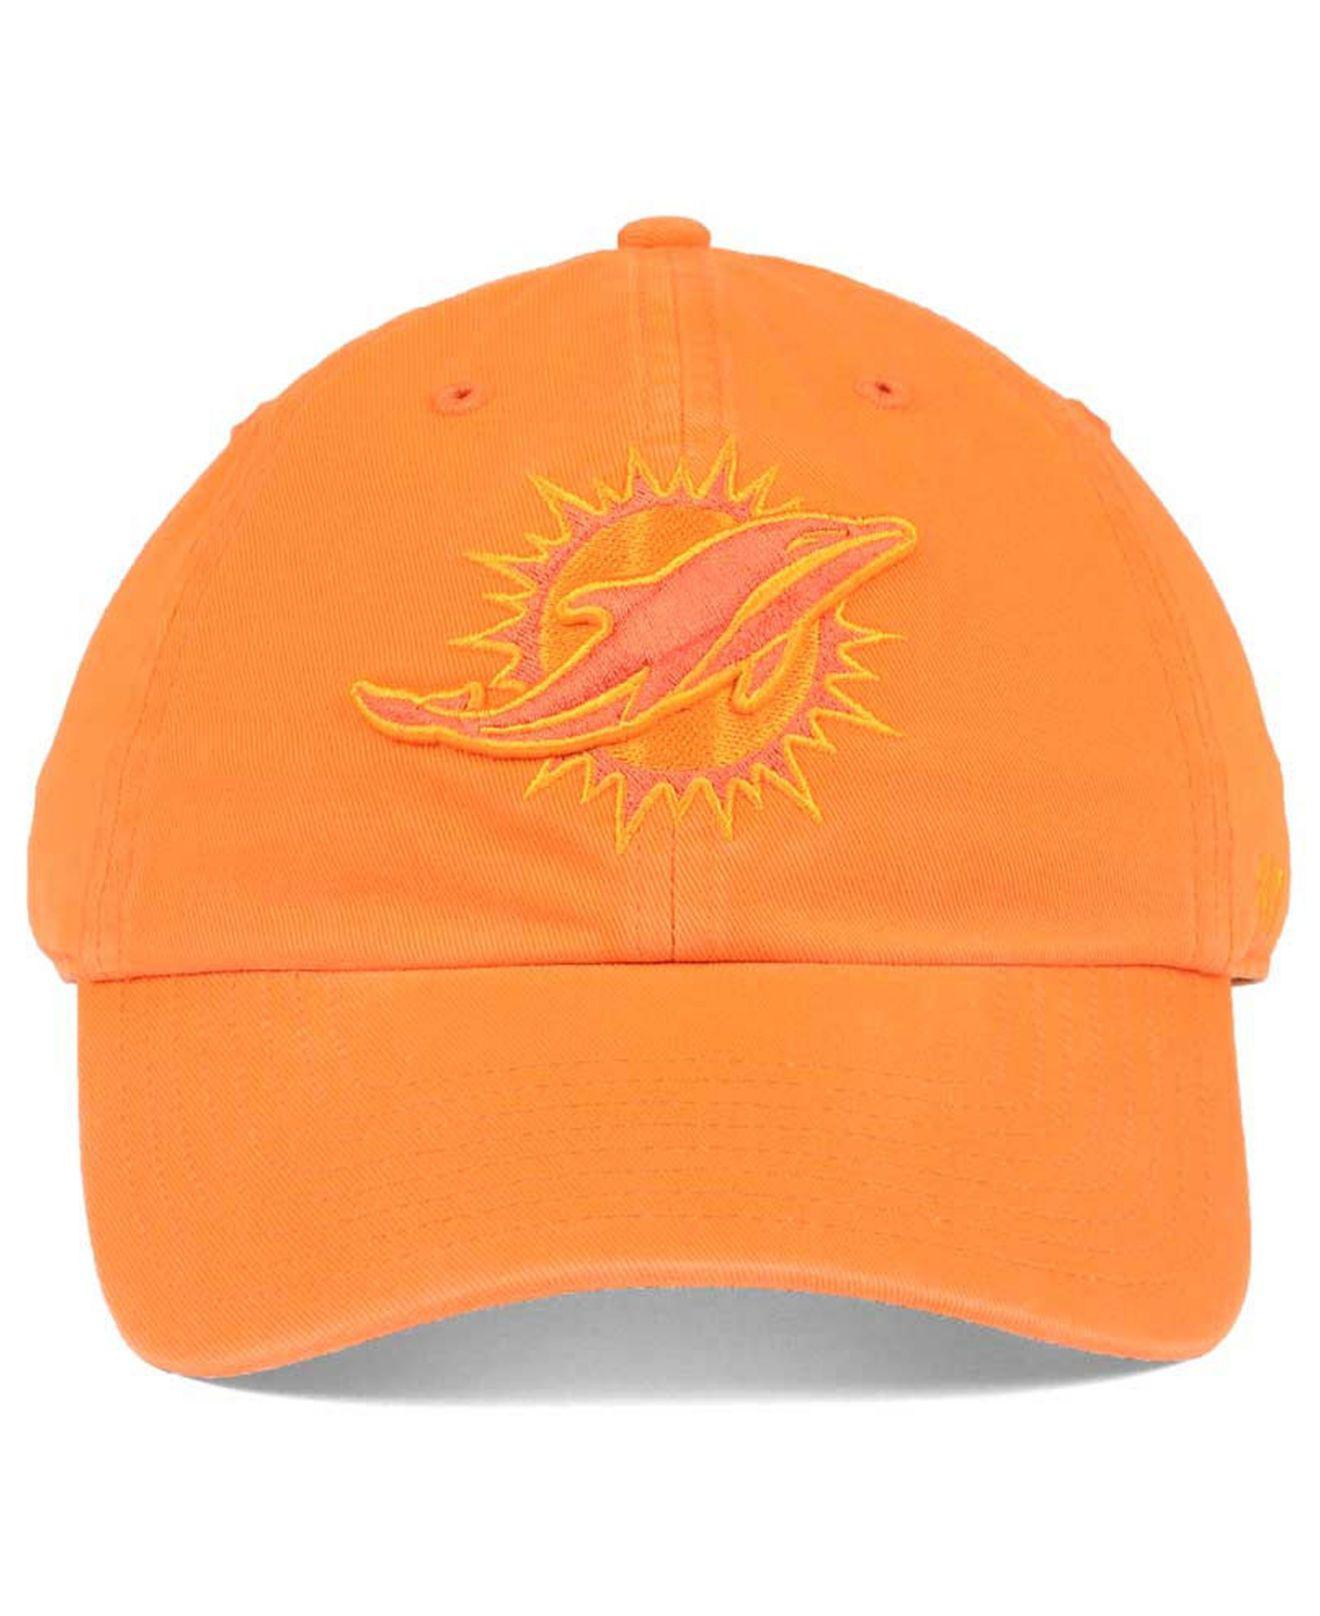 huge discount 9180f e0f01 ... reduced lyst 47 brand triple rush clean up cap in orange for men d6288  59de1